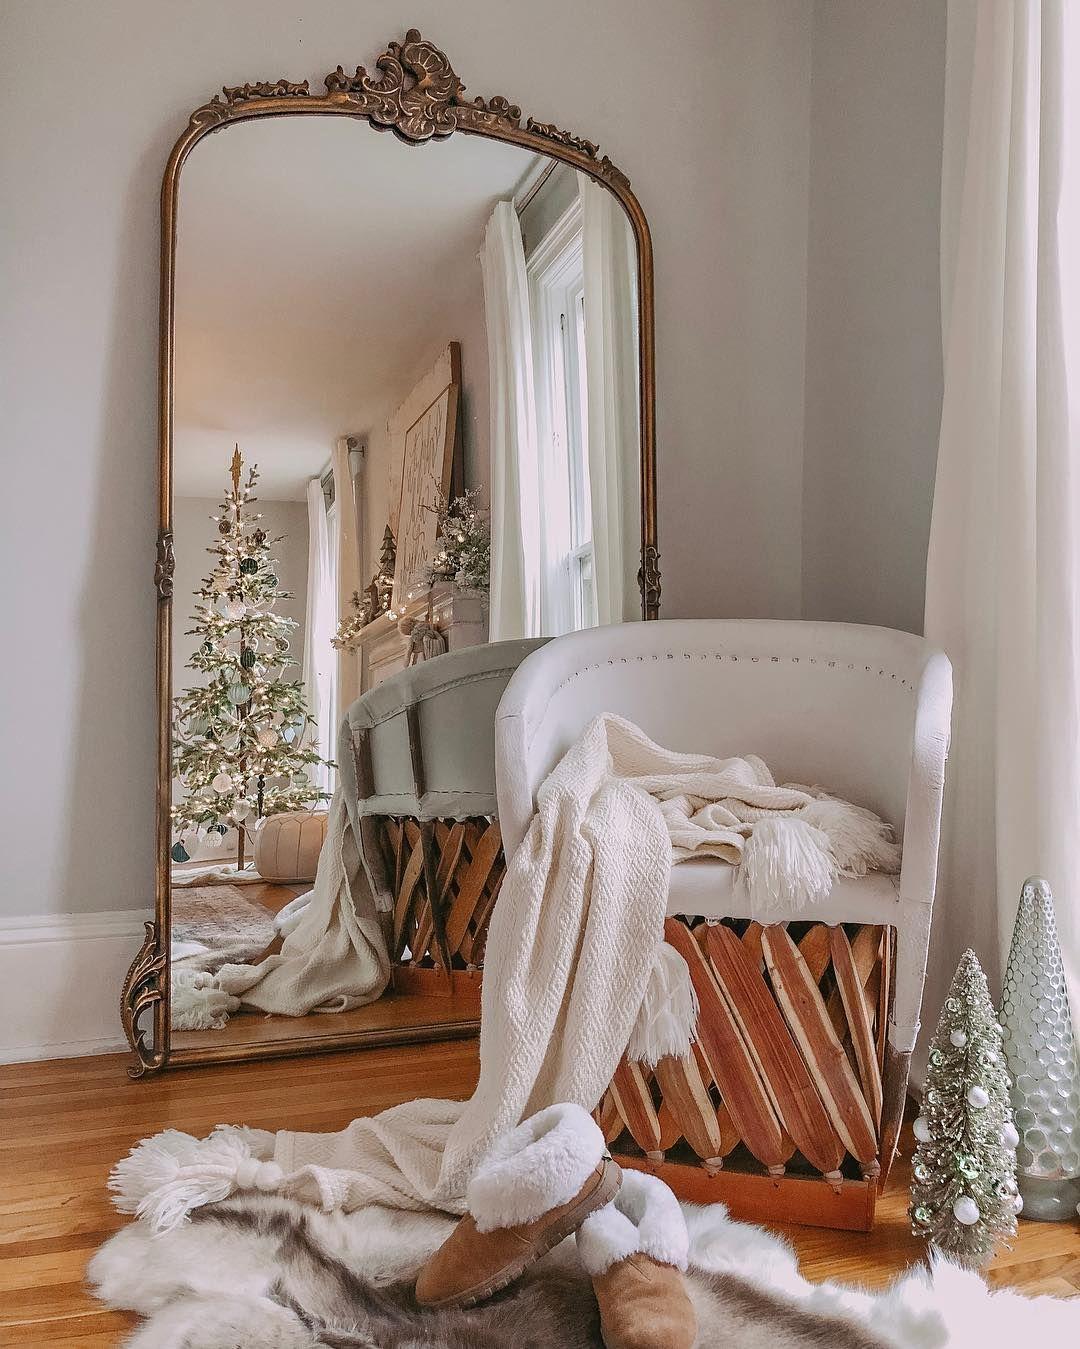 Amelie Wooden Arched Floor Mirror Arhaus Home Decor Tips Home Decor Bedroom Home Decor Styles